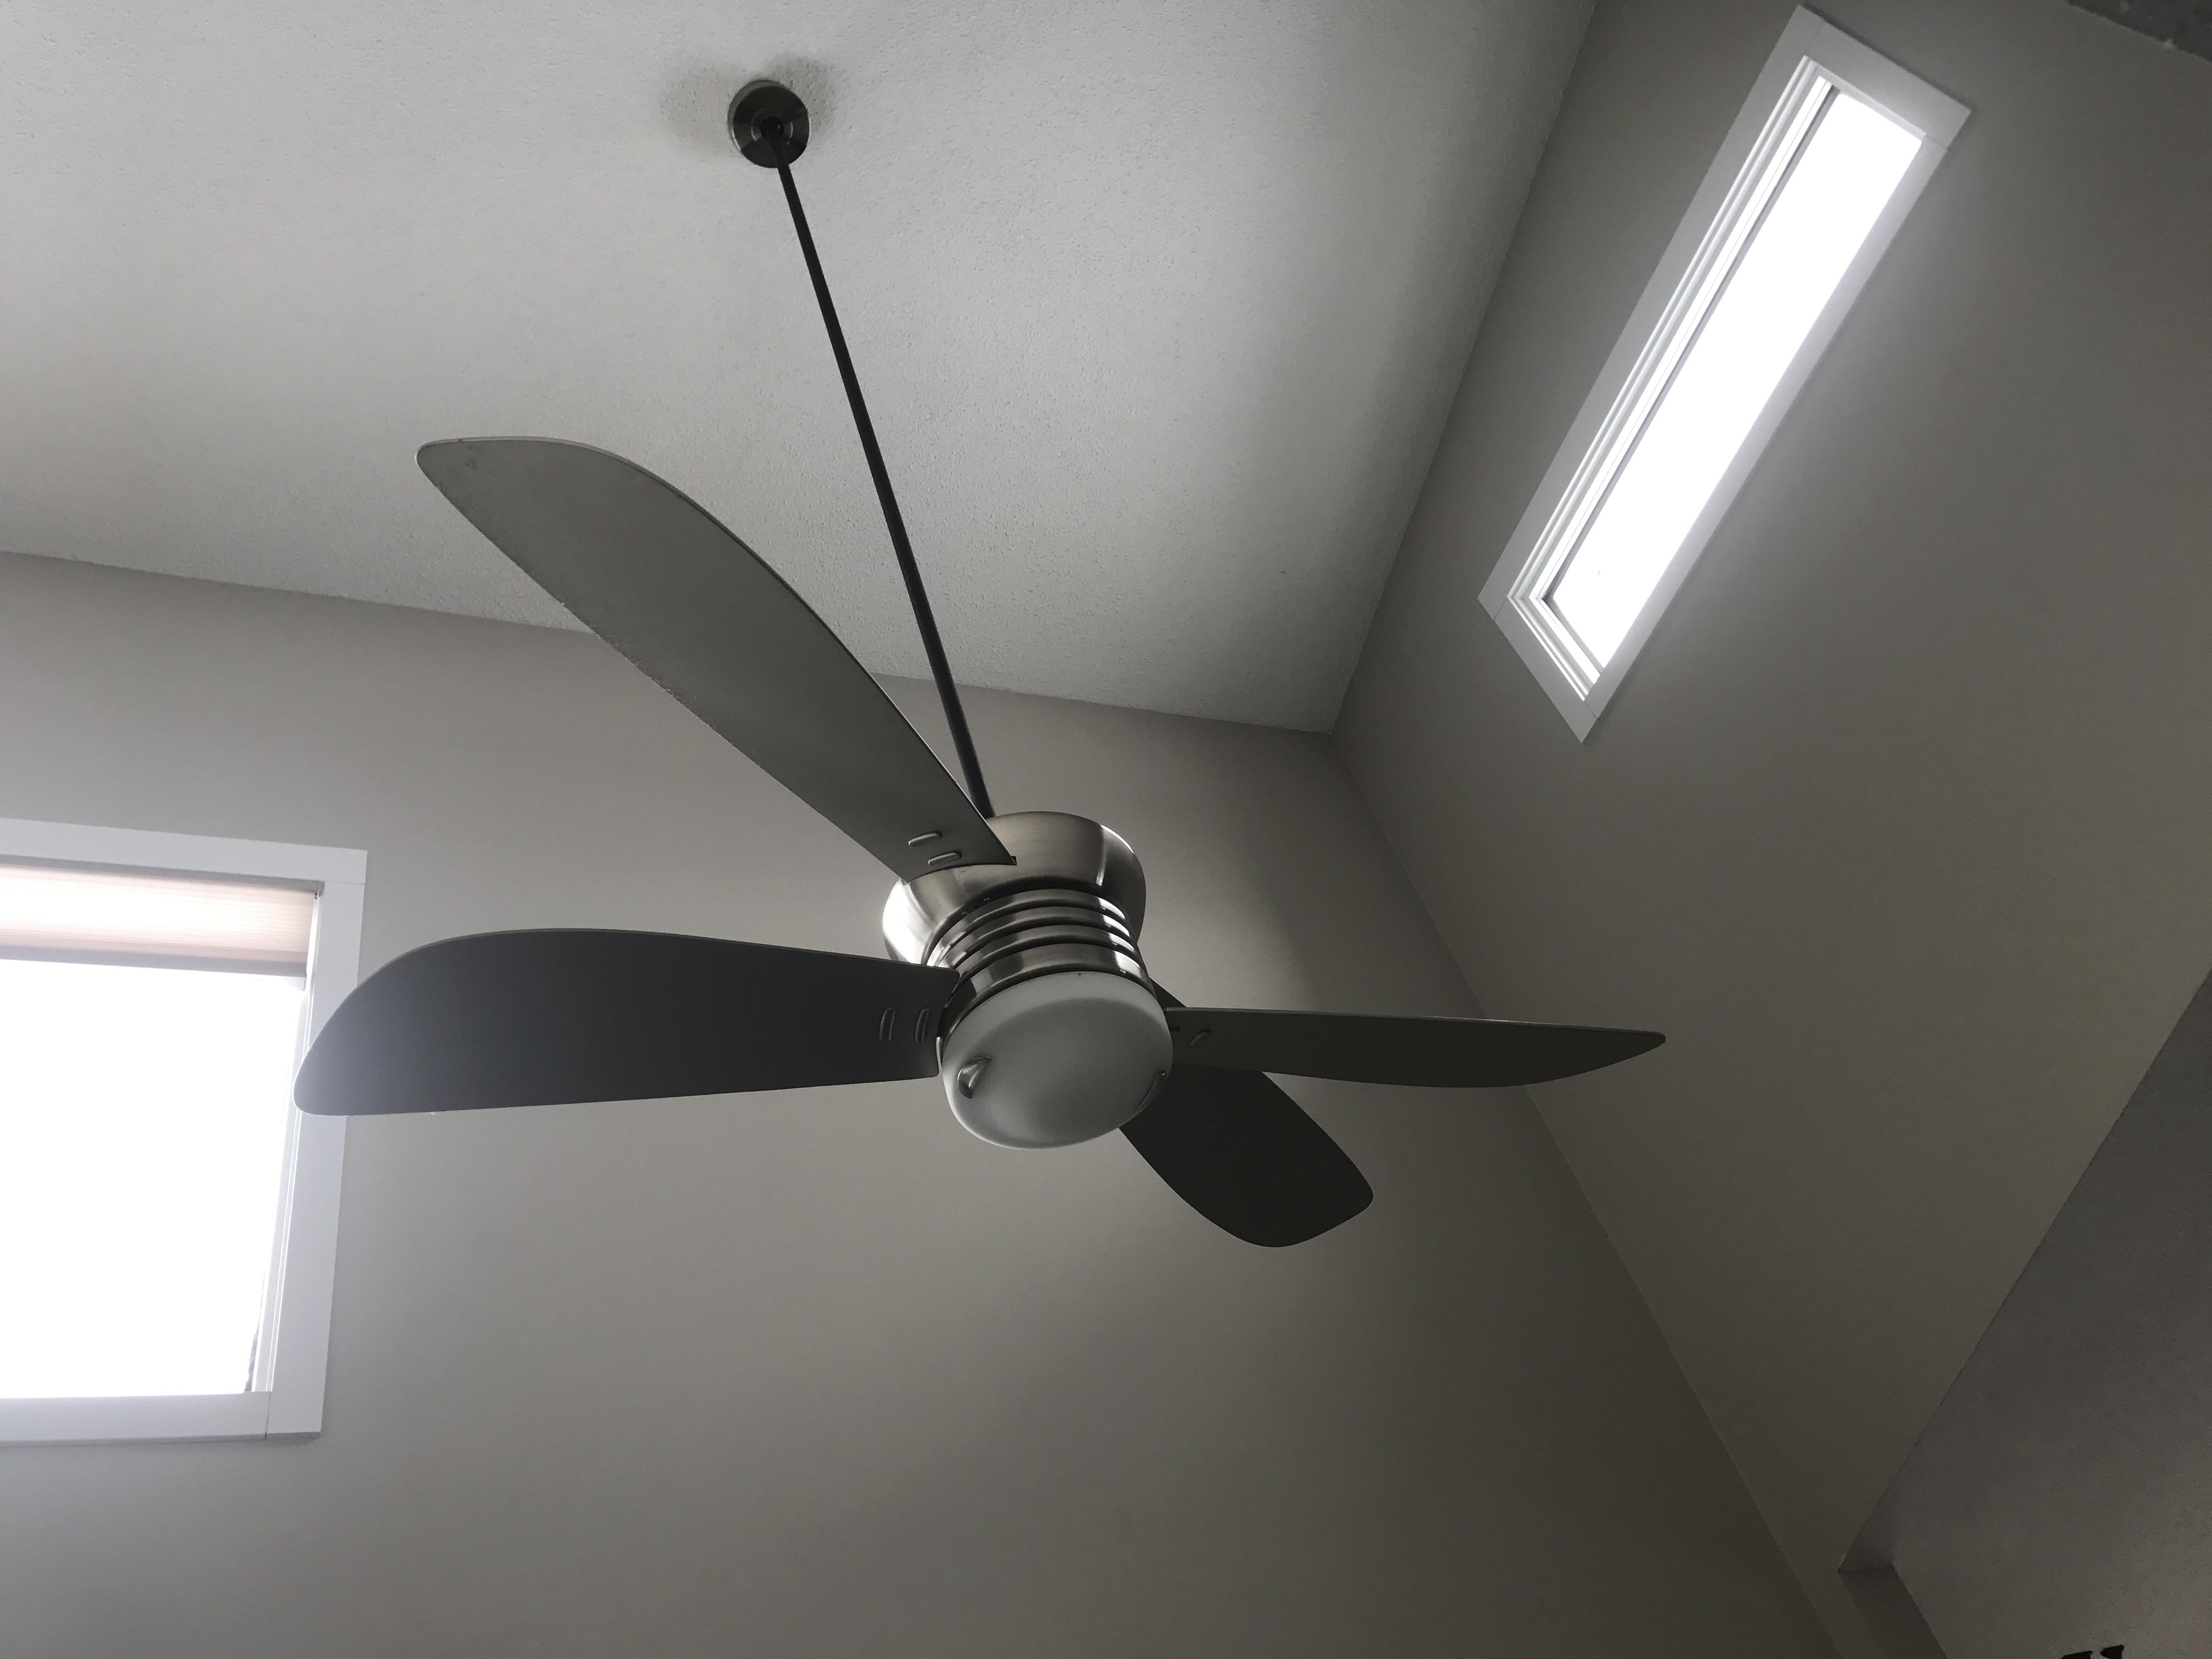 Sonshine Clean High Ceiling Fan